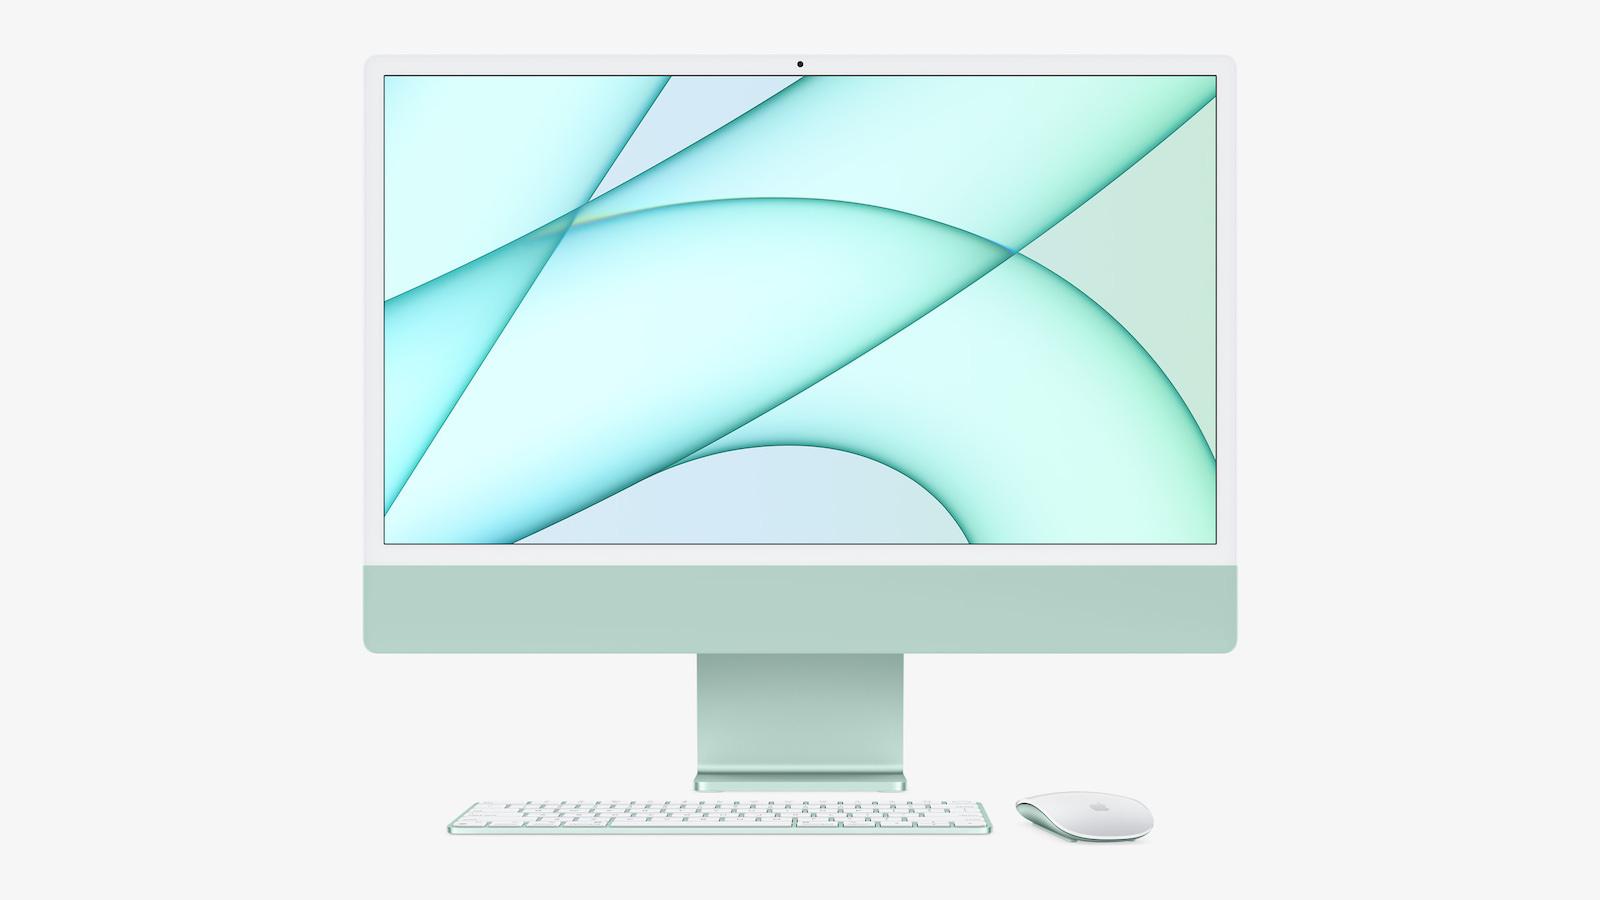 apple_new-imac-spring21_pf-green-accessories_04202021.jpg